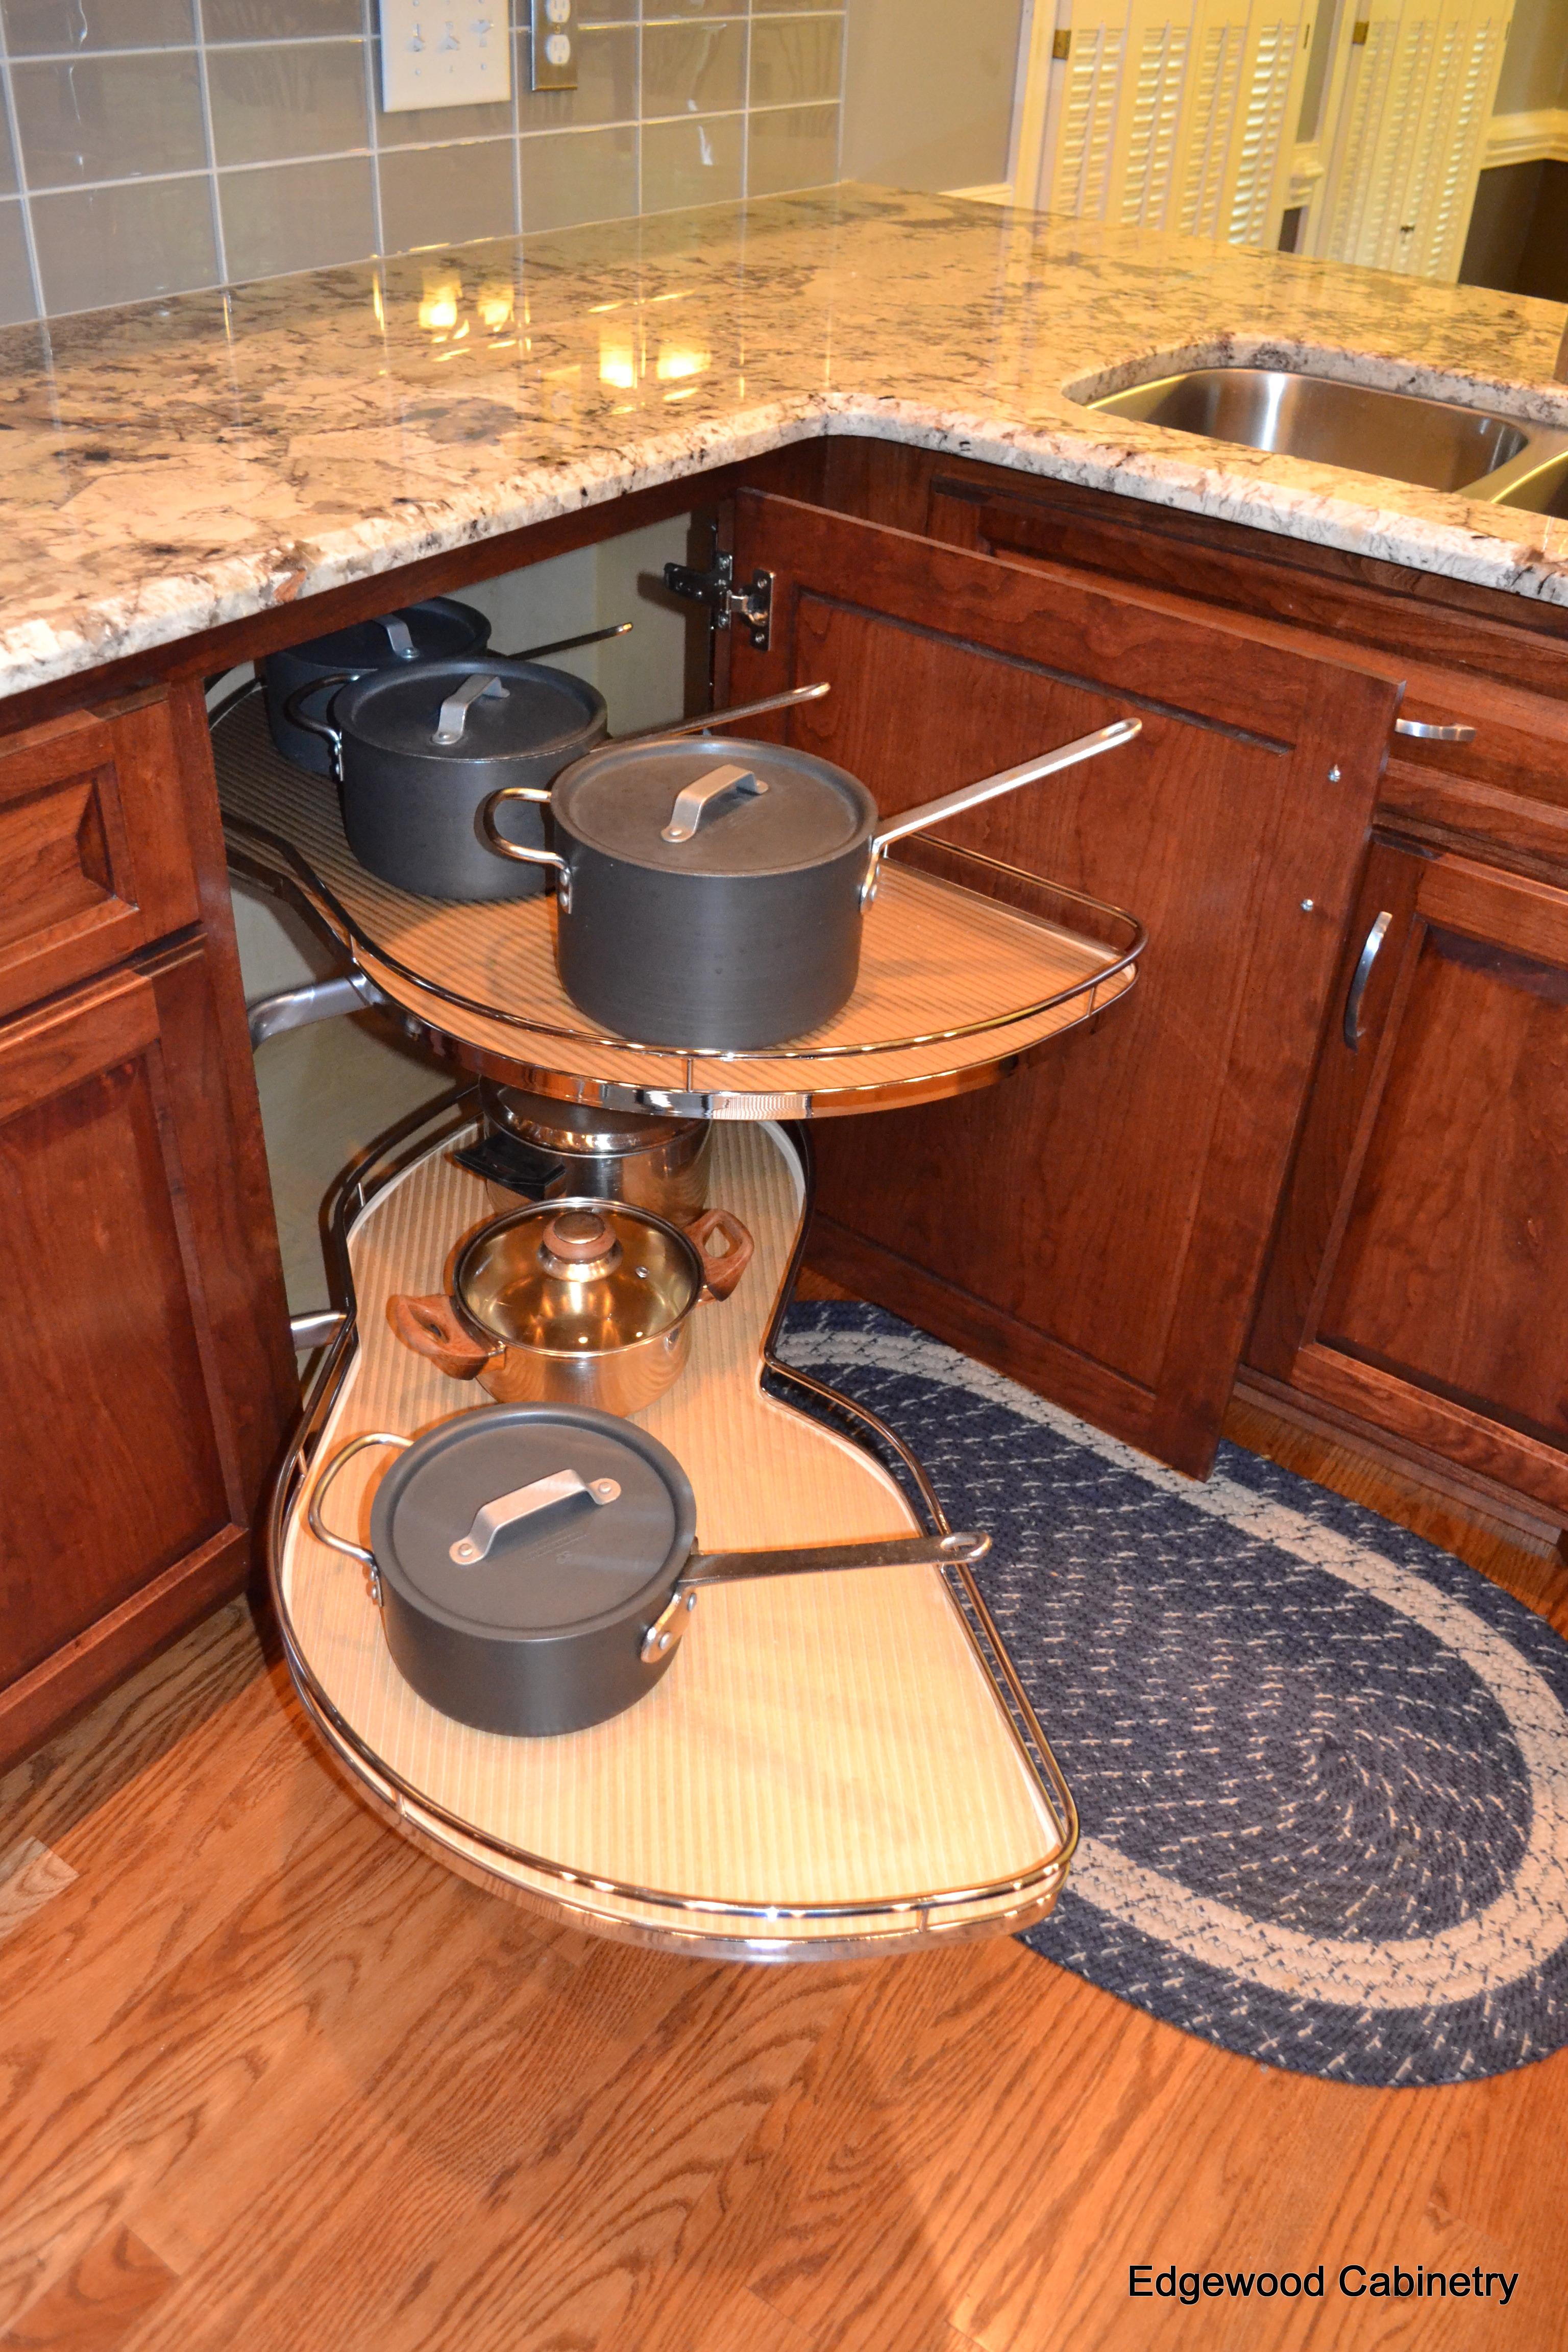 corner cabinet solutions edgewood cabinetry. Black Bedroom Furniture Sets. Home Design Ideas